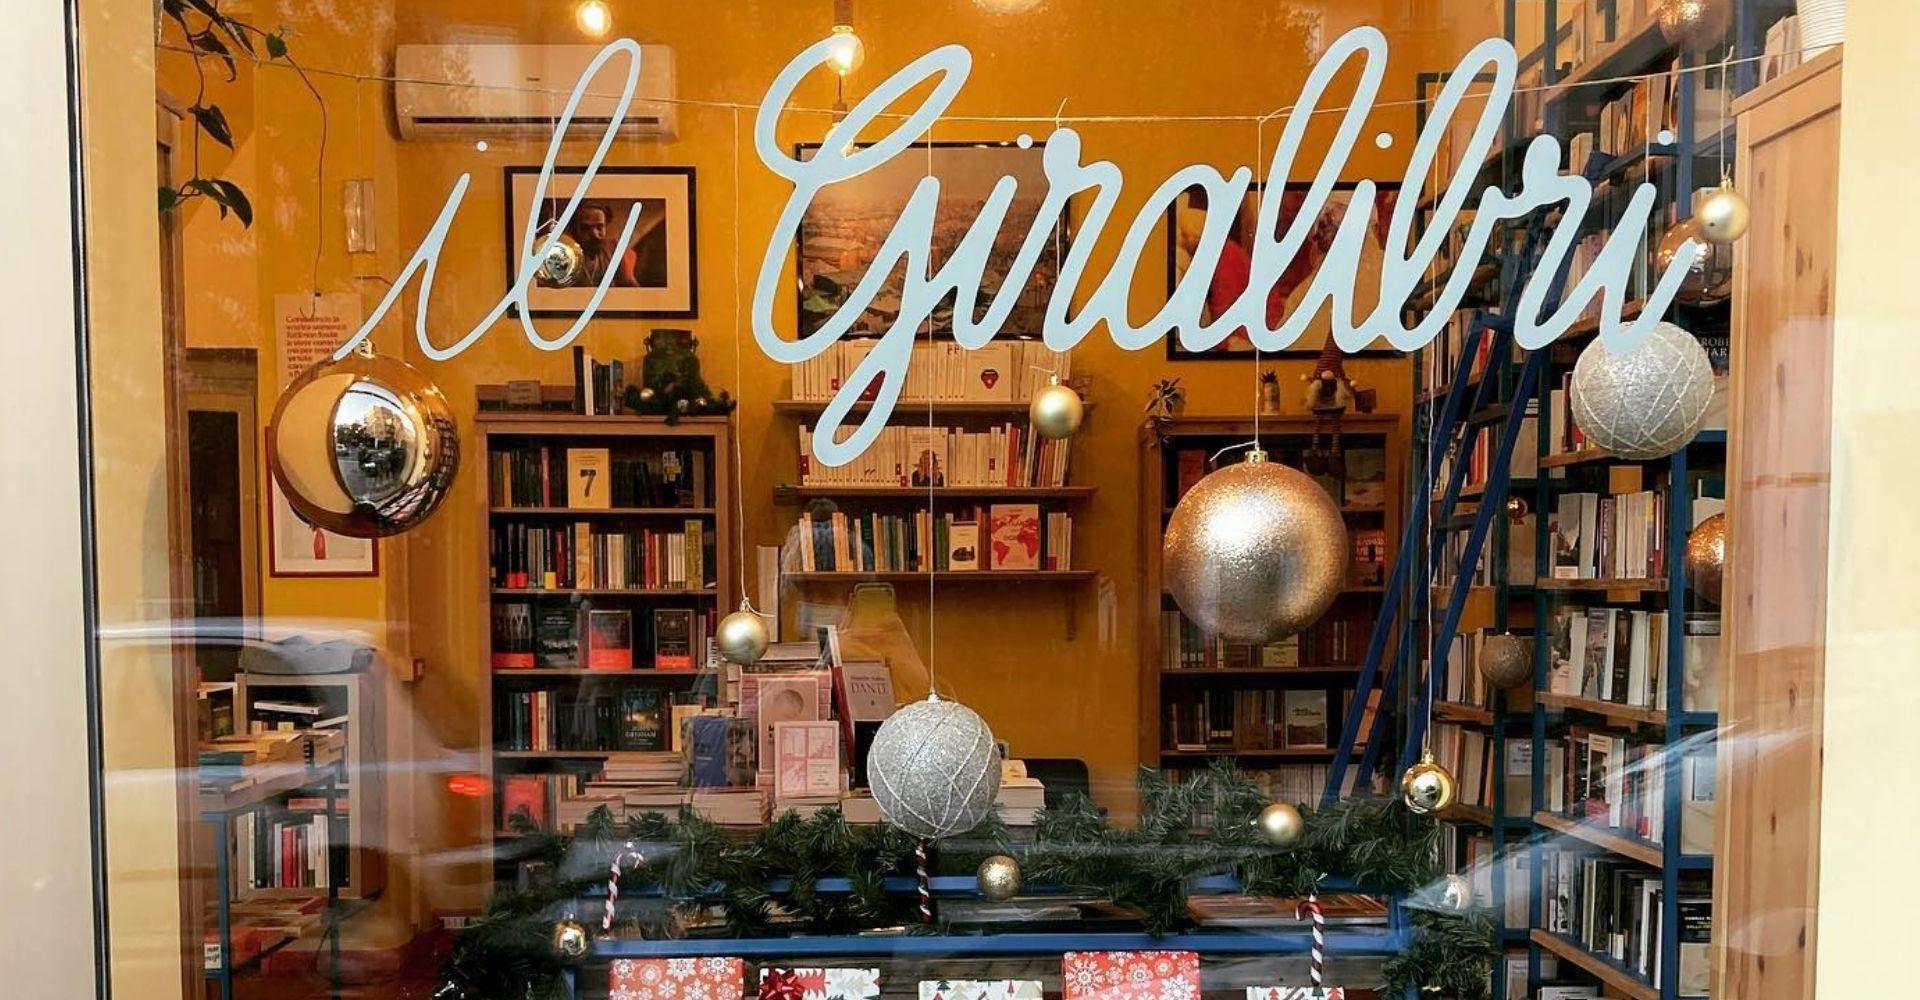 A Mestre, in piena pandemia, apre una libreria indipendente